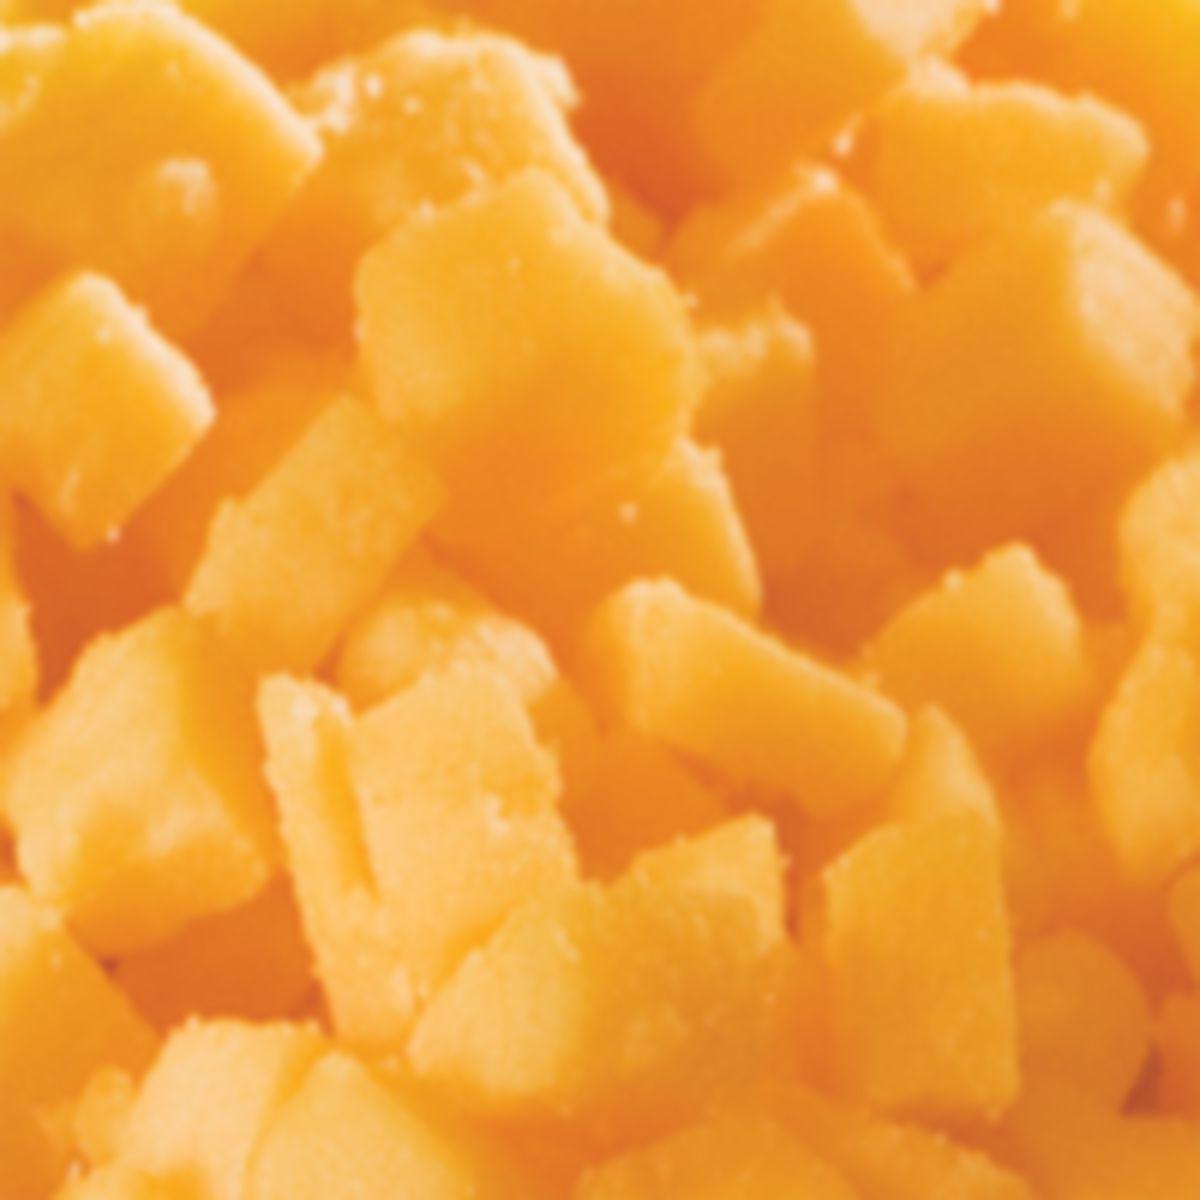 Cabela's High-Temperature Cheese – 1 lb.